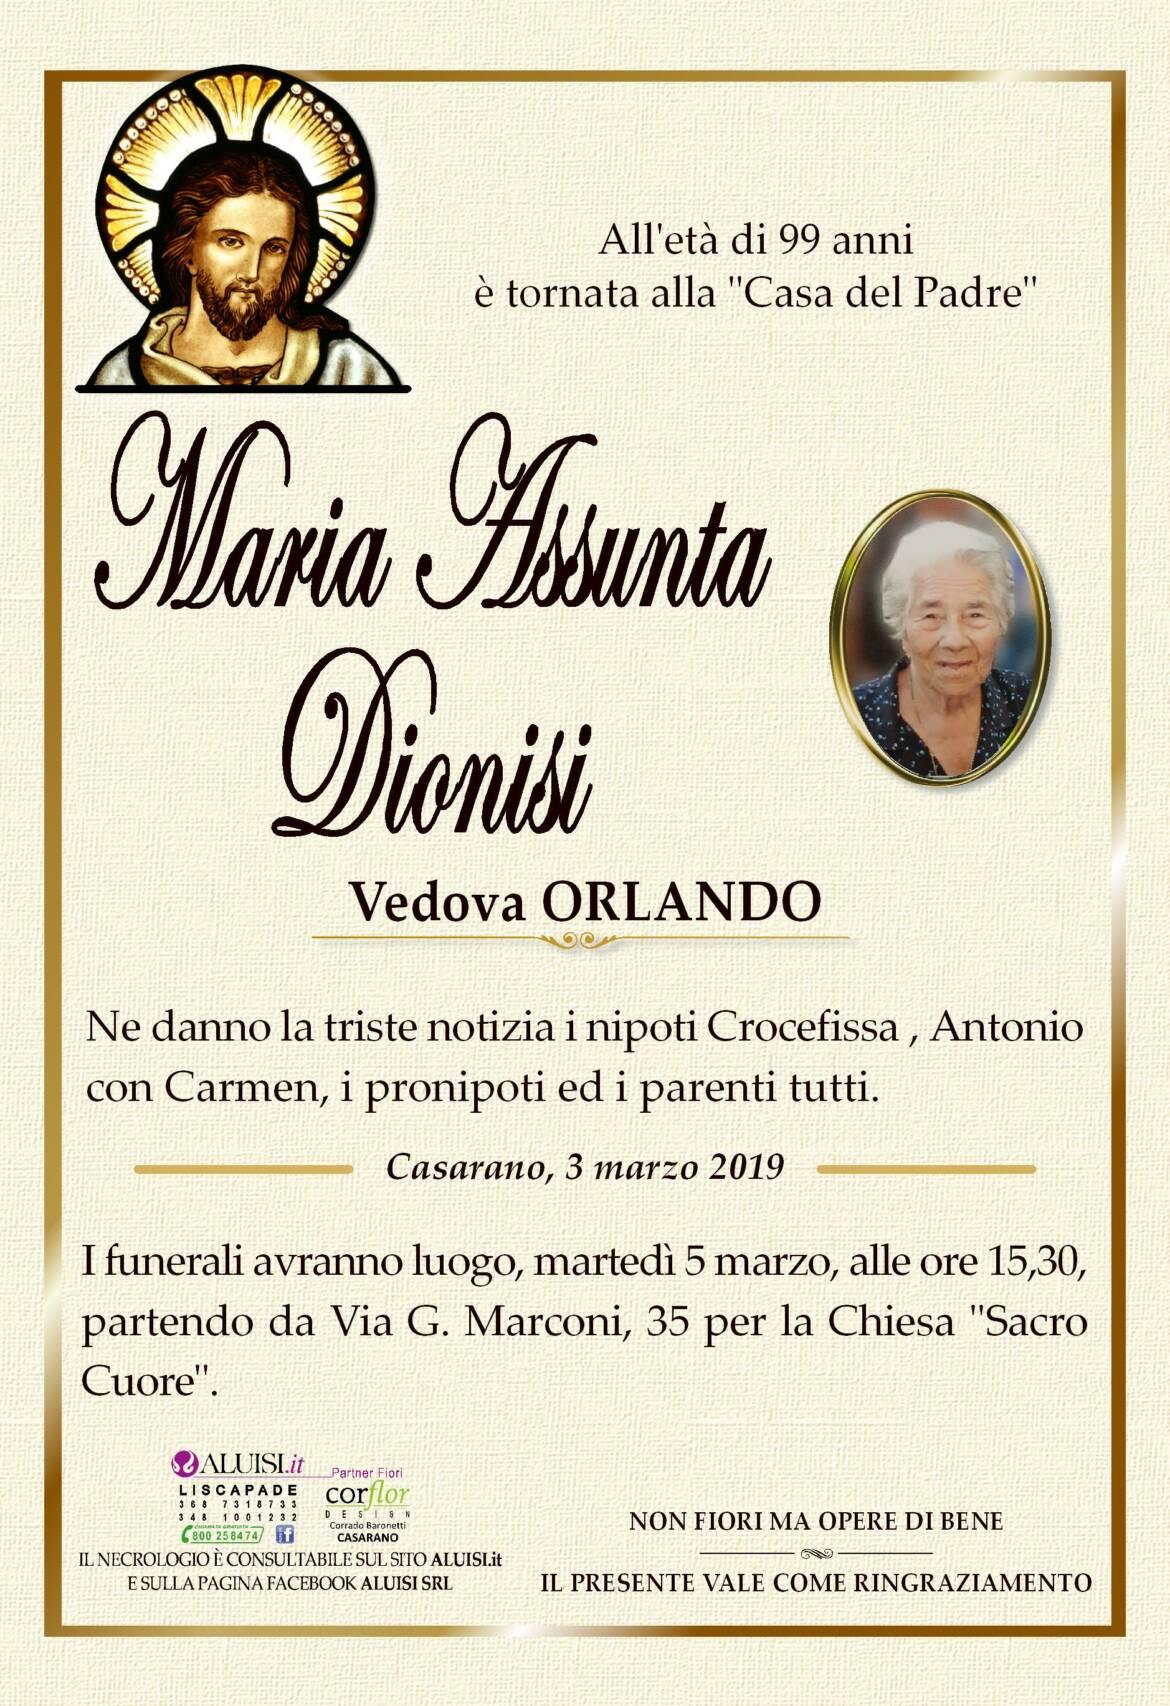 ANNUNCIO-maria-assunta-dionisi-fb.jpg